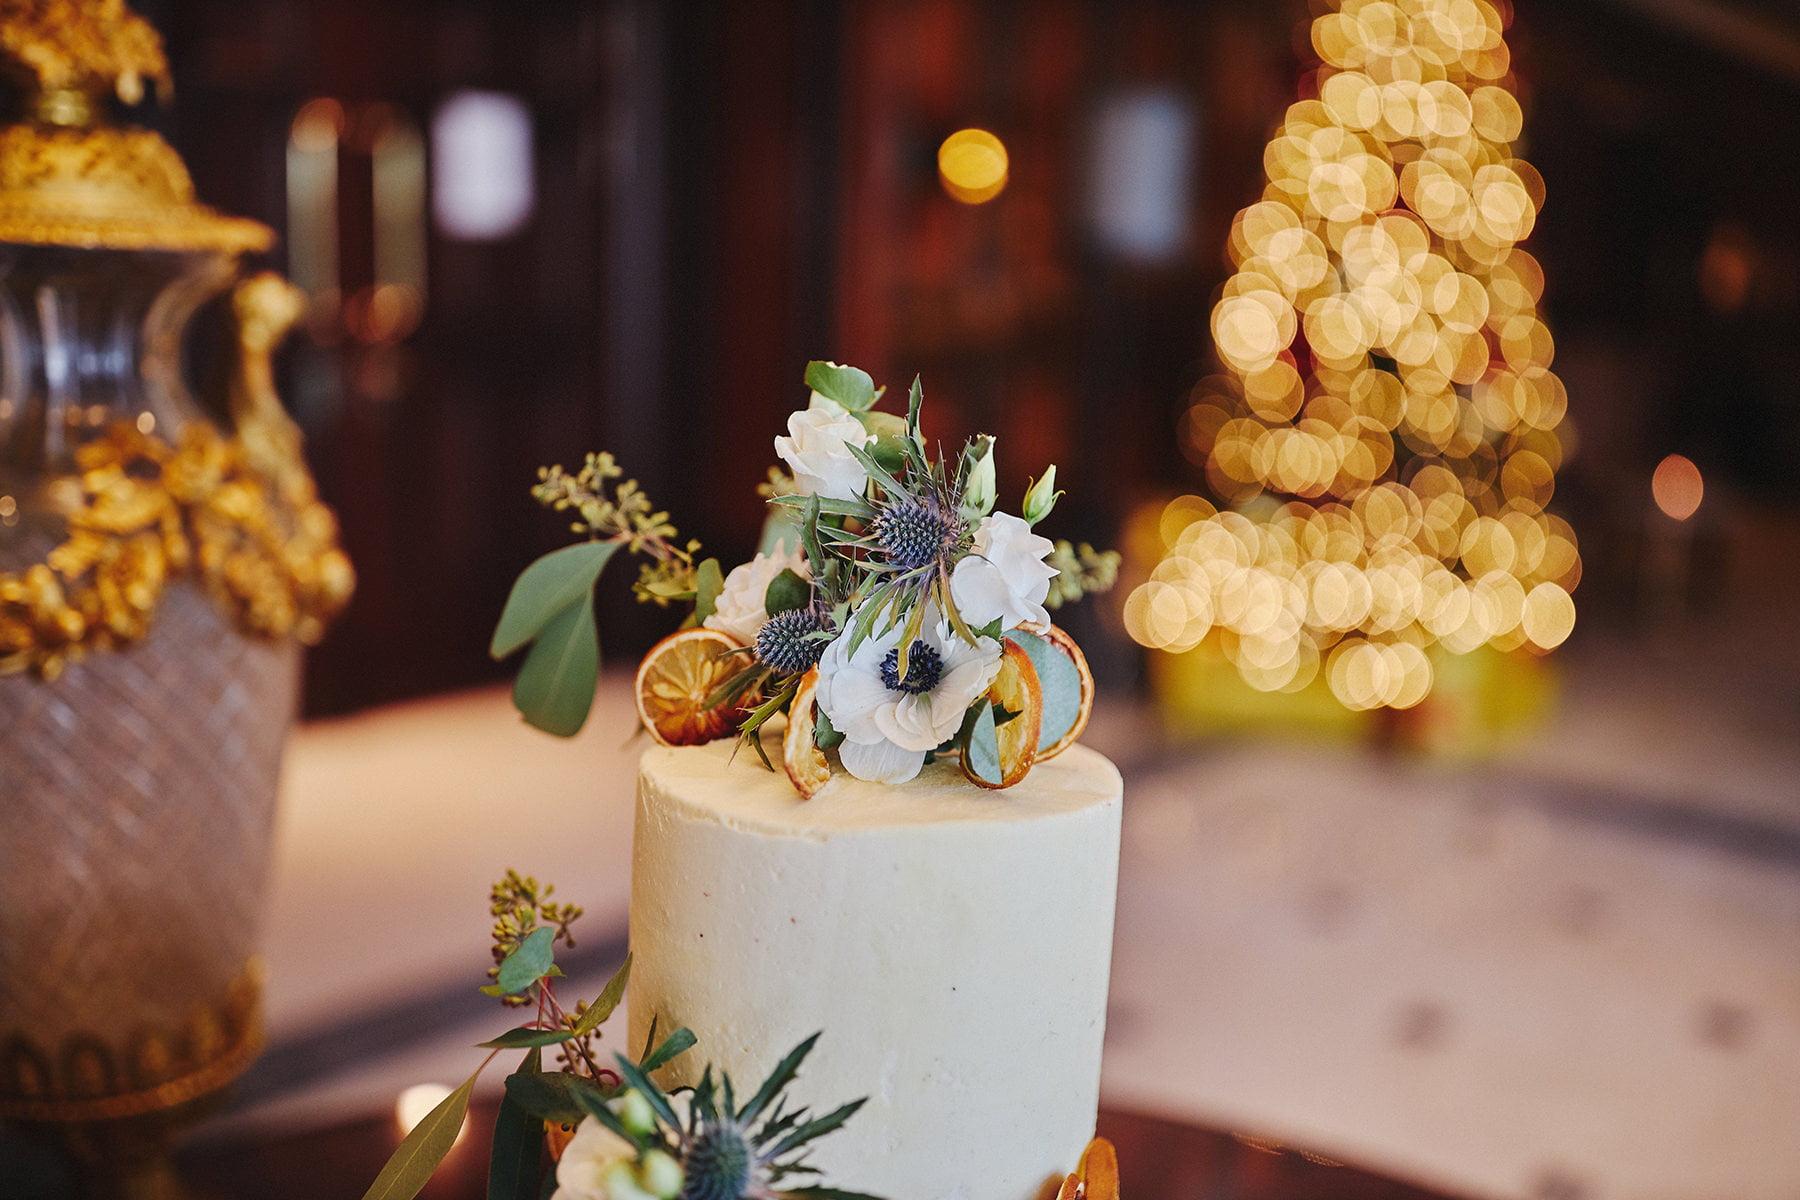 POWERSCOURT HOTEL RESORT INTIMATE WEDDING 30